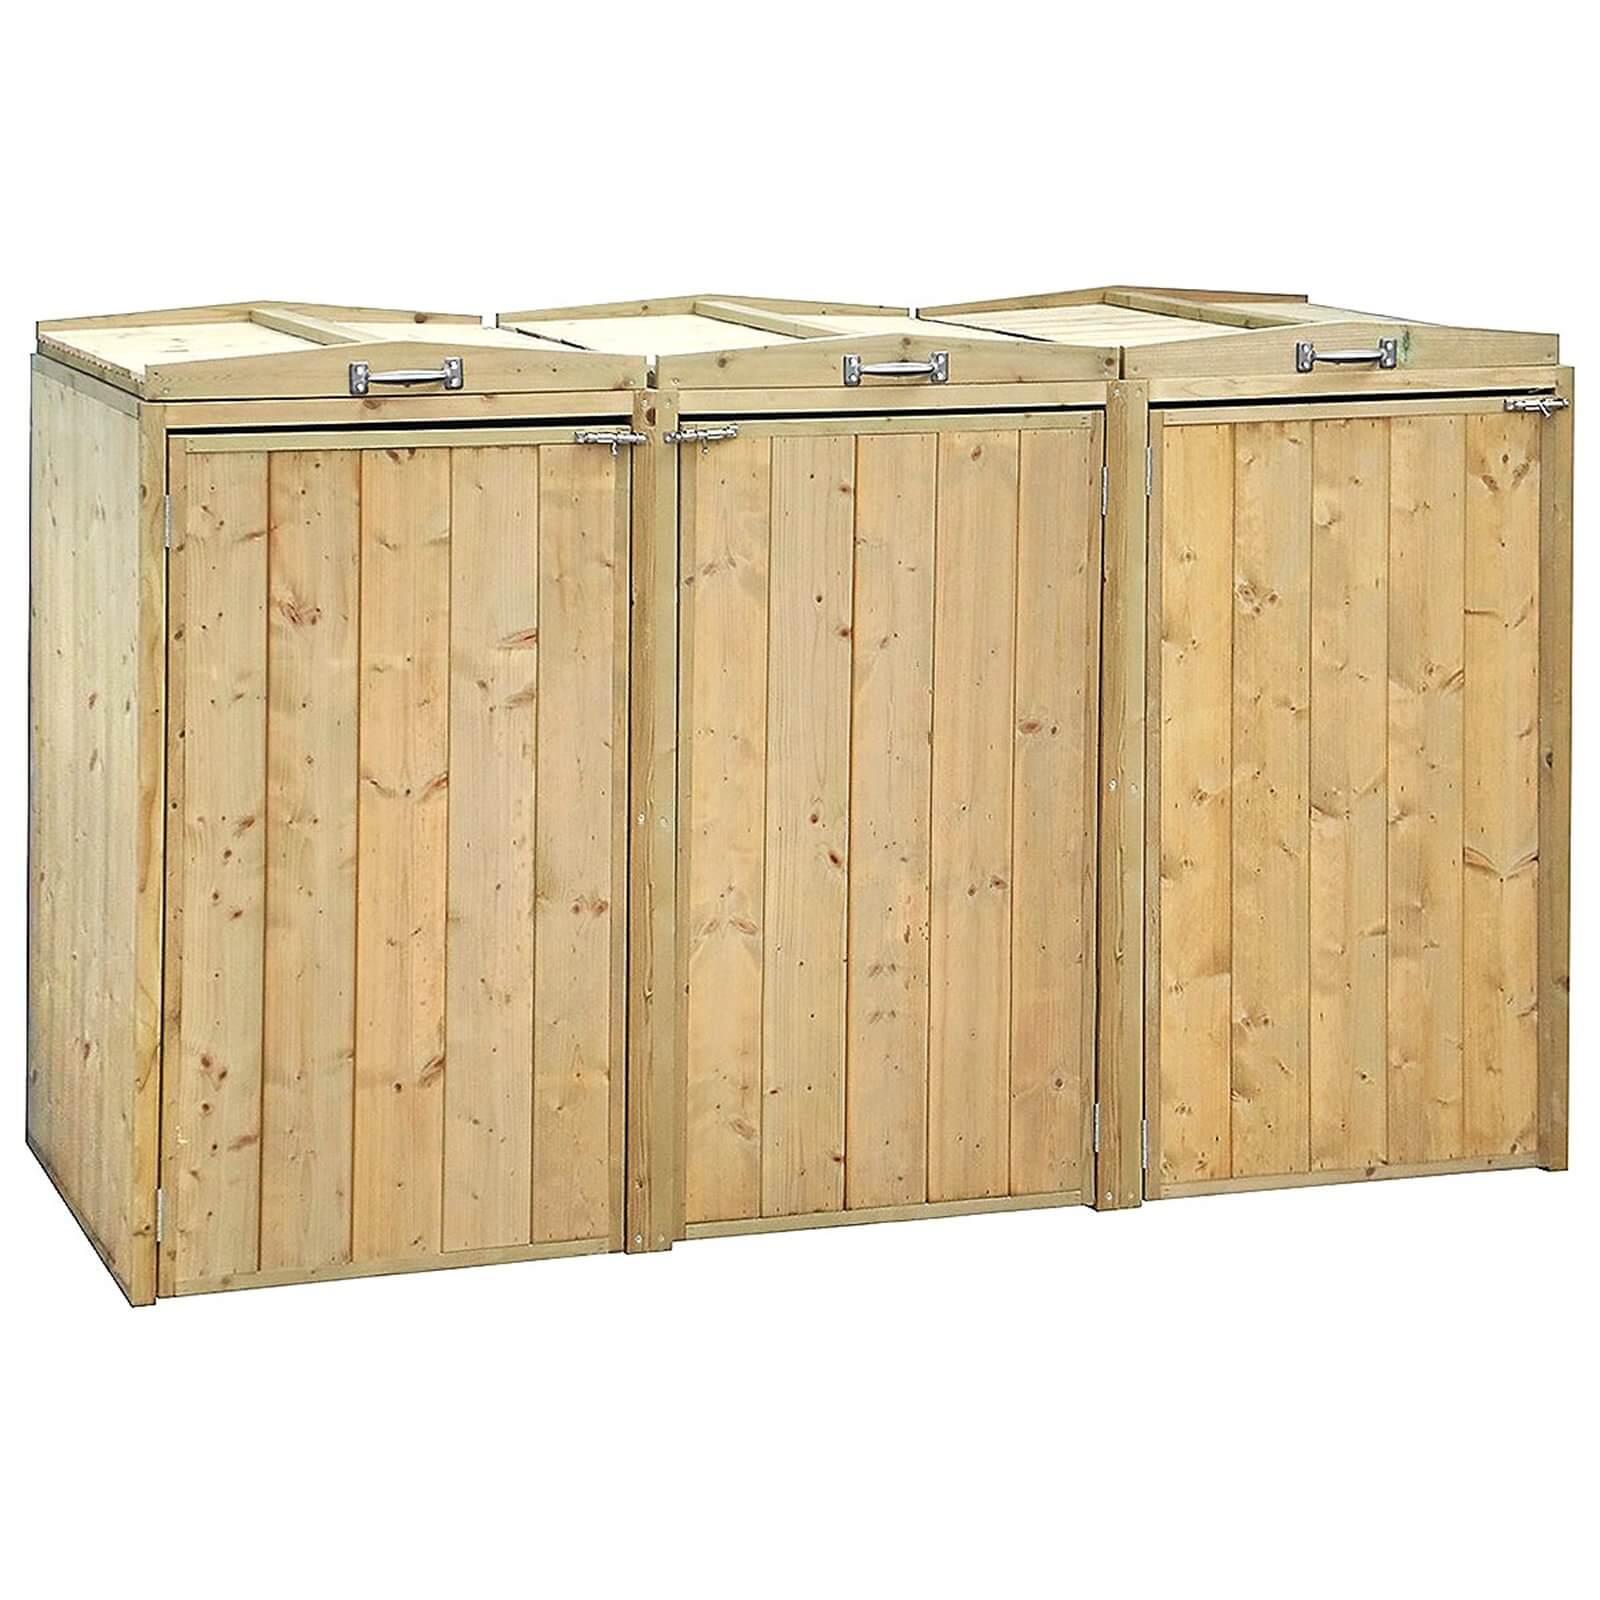 Charles Bentley Premium FSC Wooden Double Wheelie Bin and Recycle Box Storage